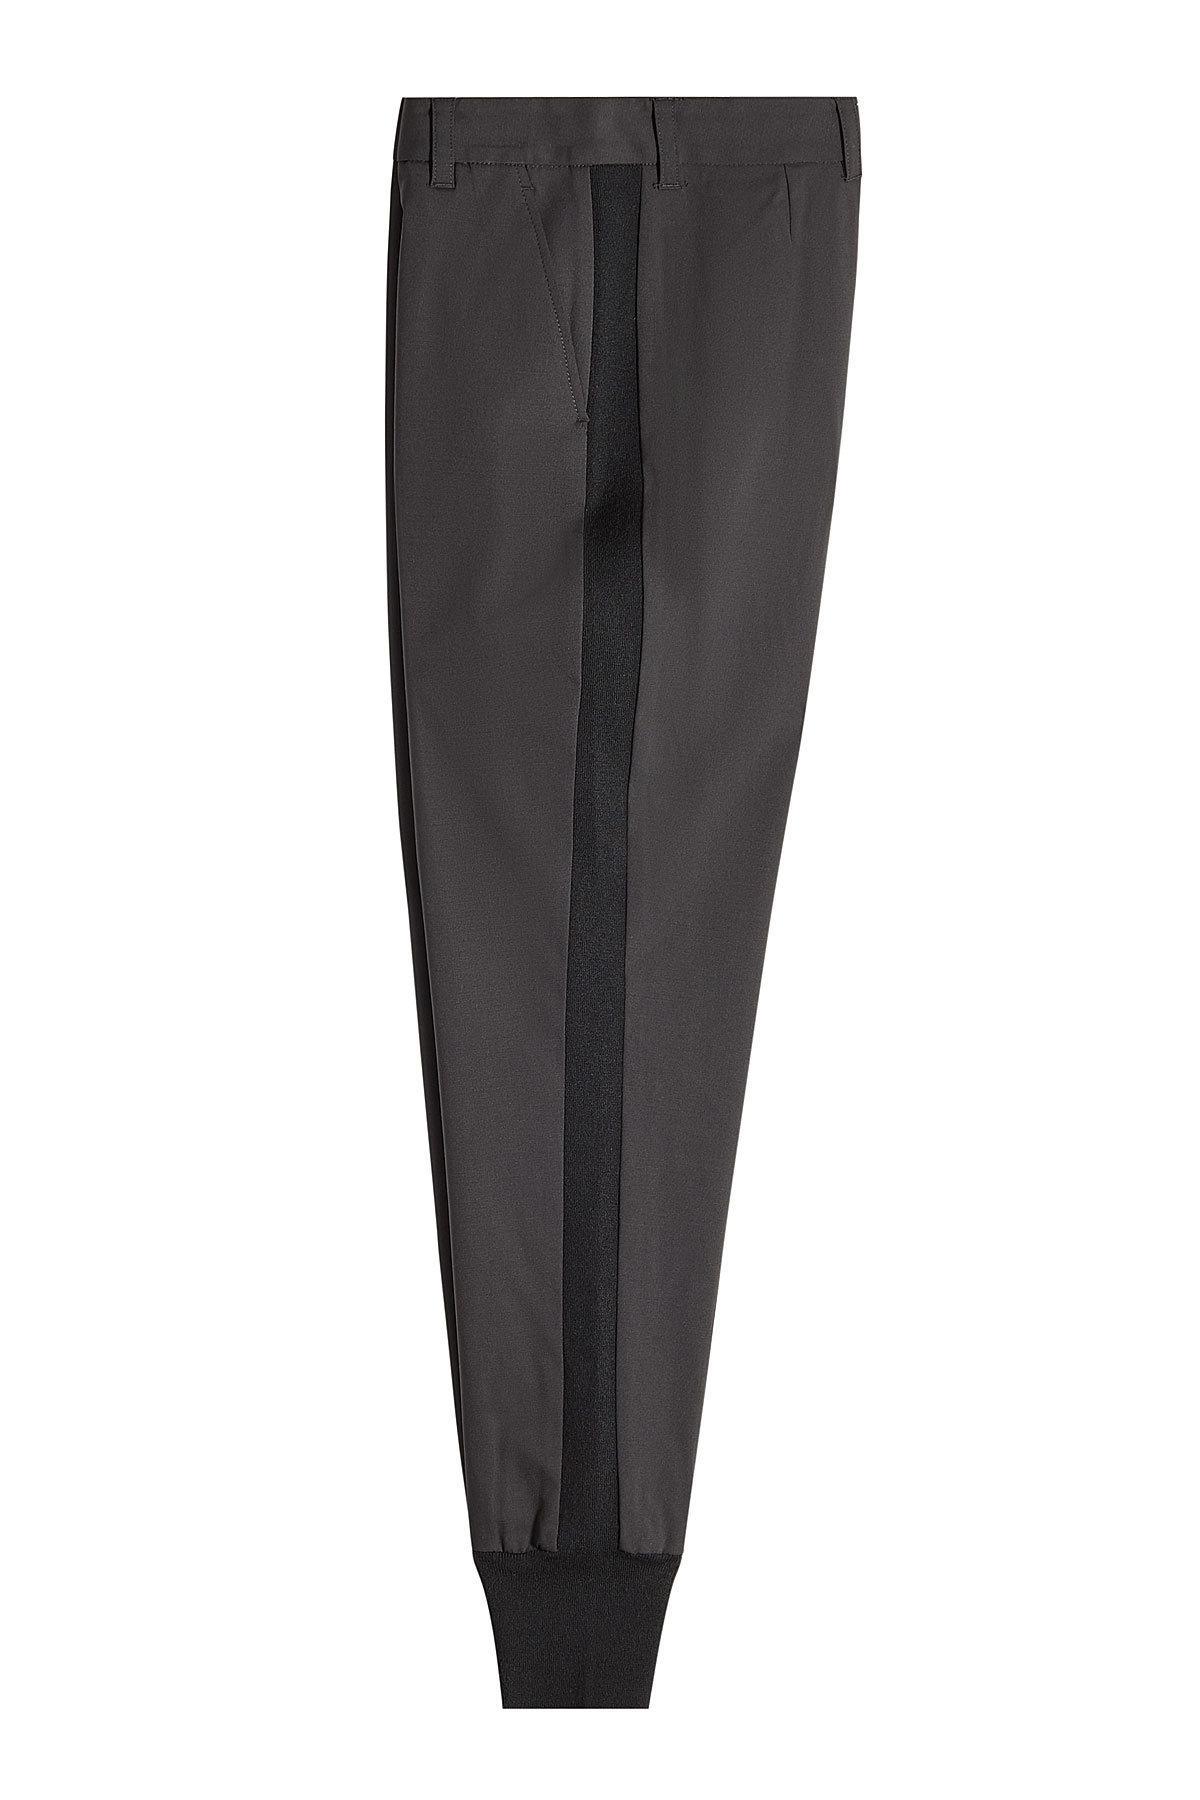 3.1 Phillip Lim Wool Jogger Pants In Black